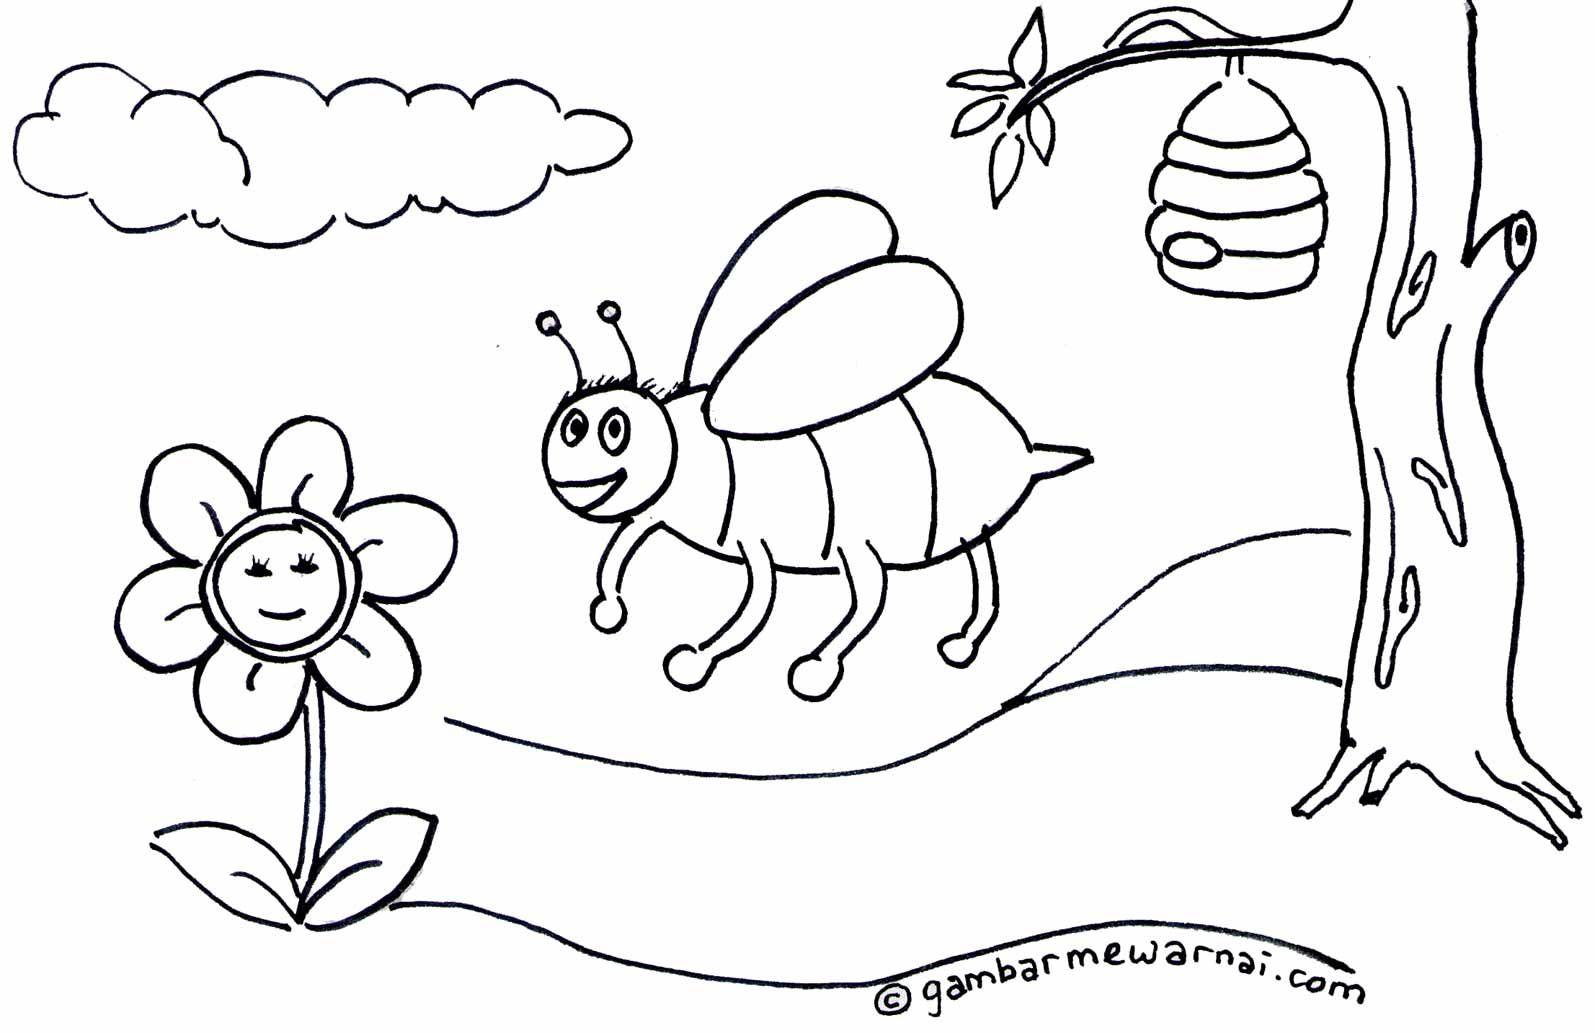 Contoh Gambar Mewarnai Lebah Places to Visit Pinterest